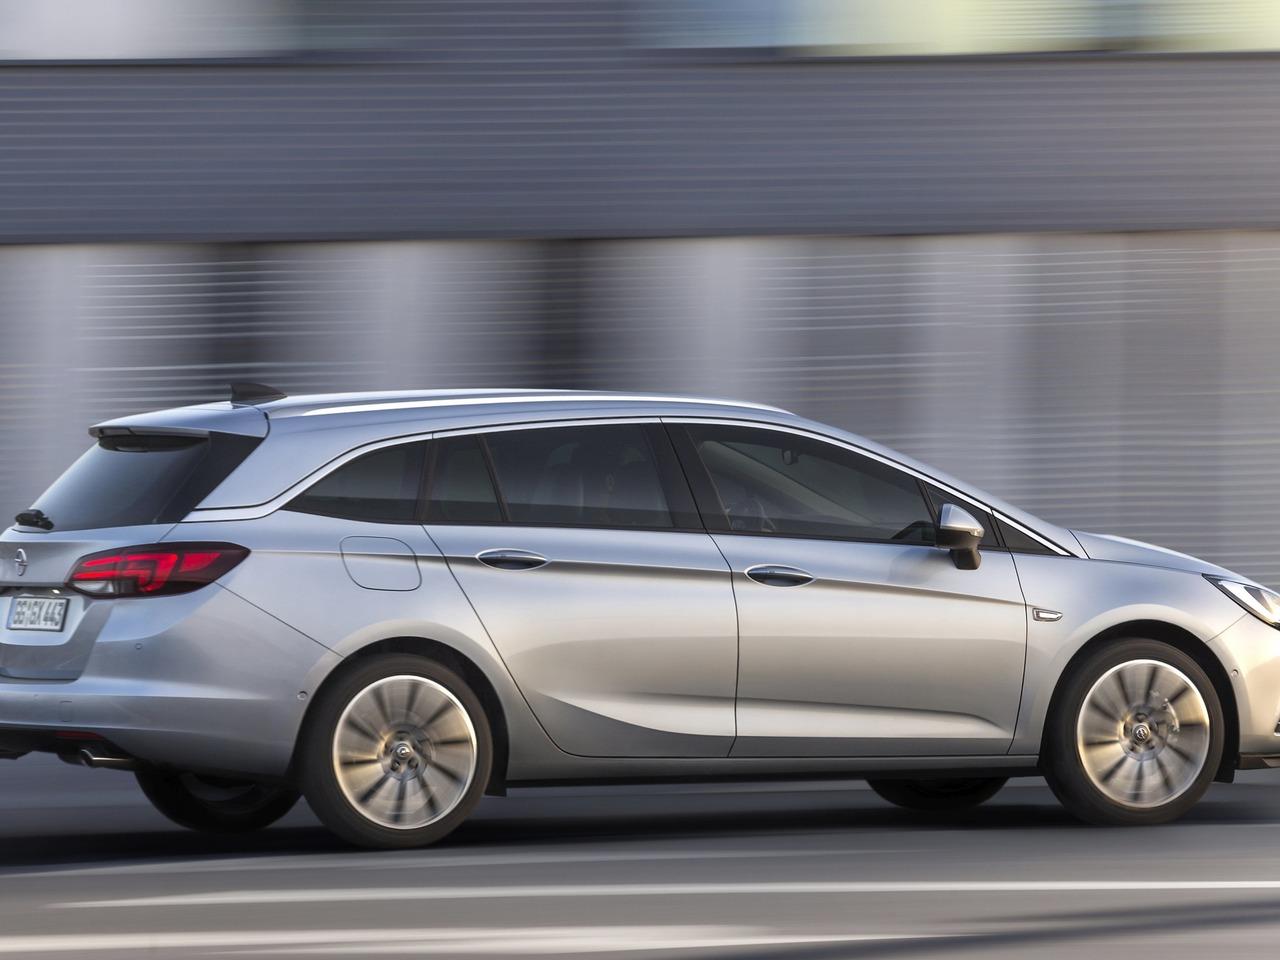 Снимки: Opel Astra K Caravan